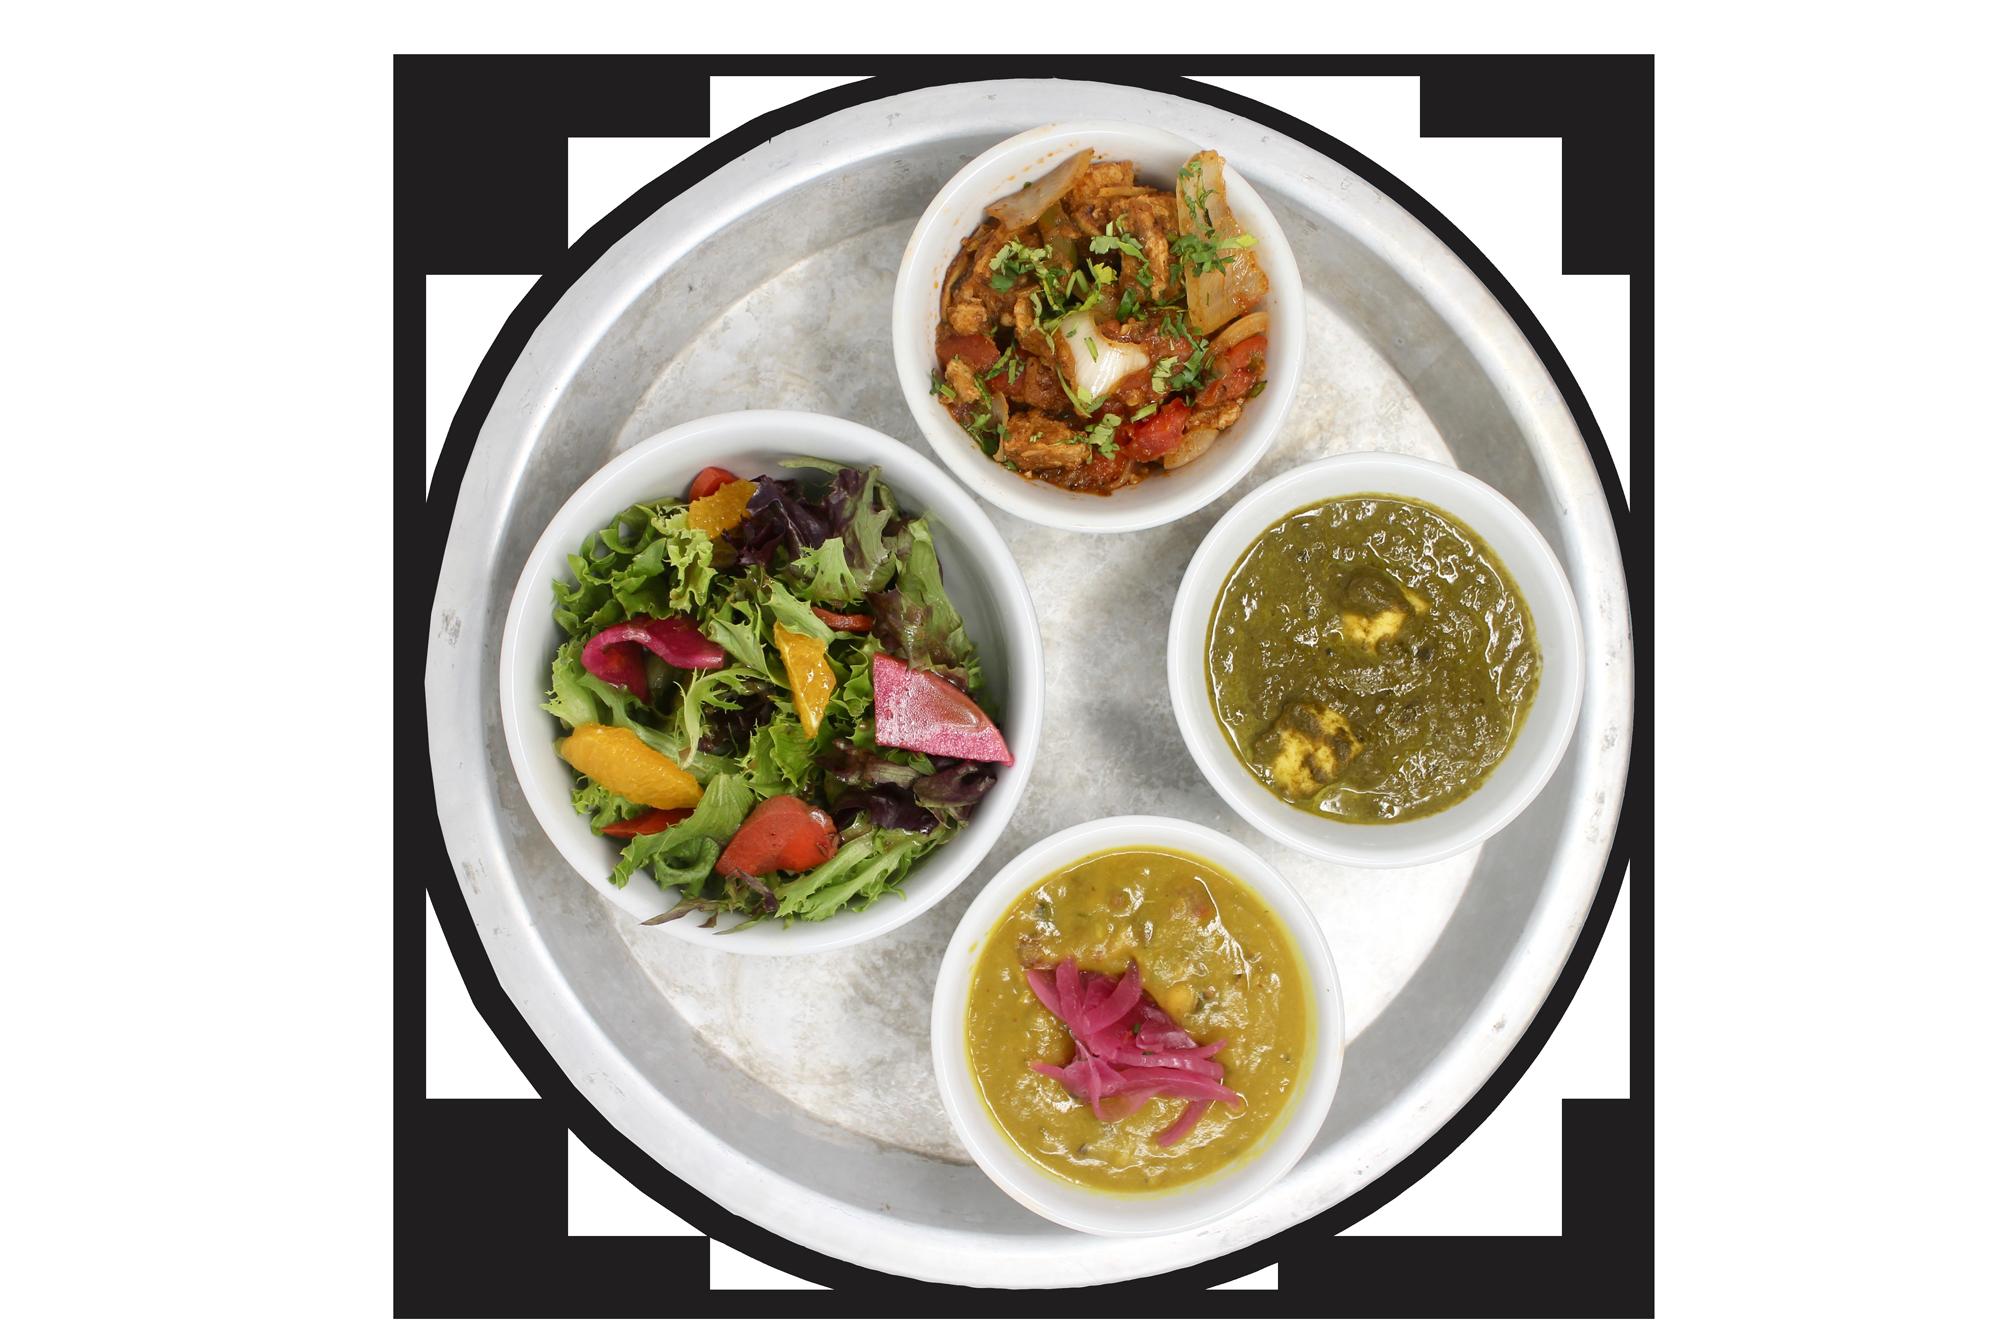 #KARMAPROTEIN   bowls of daal lentils, saag paneer, free range plant protein, local organic salad